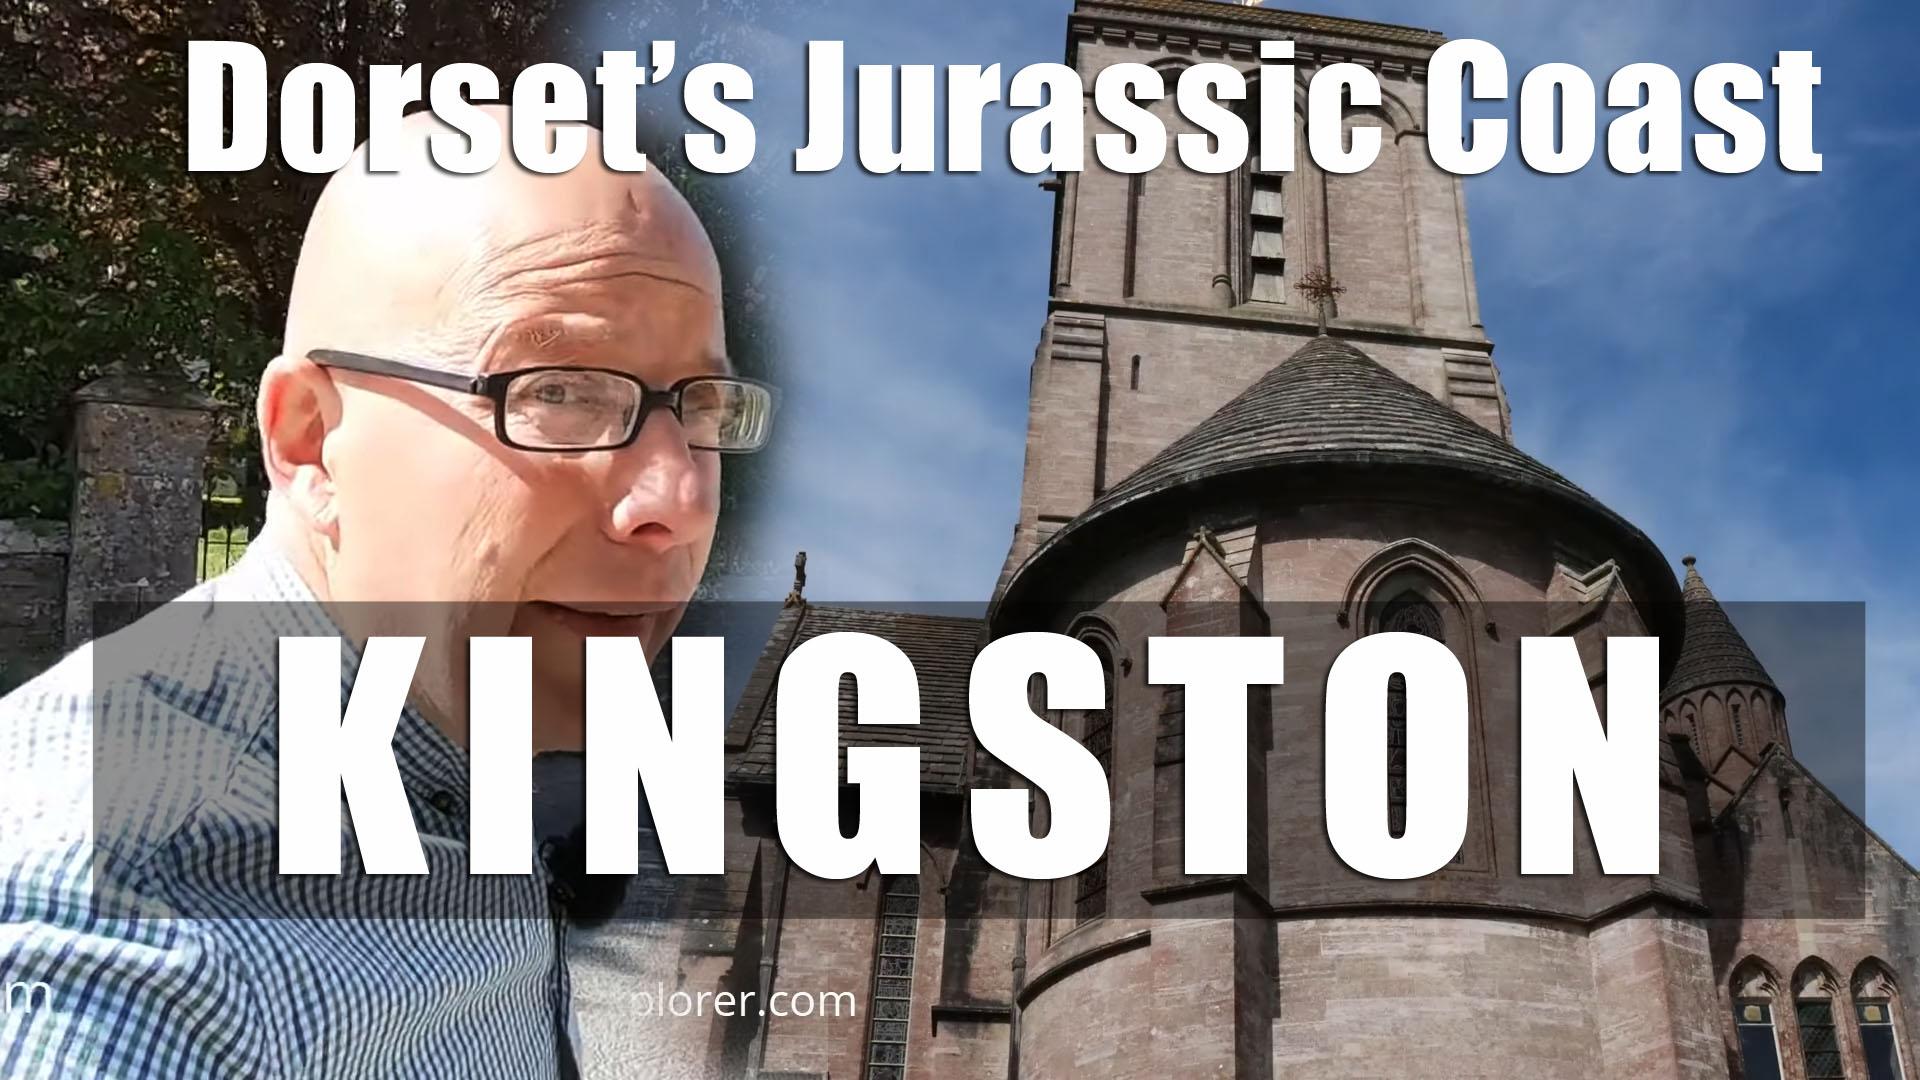 Dorset's Jurassic Coast - The Two Churches of Kingston